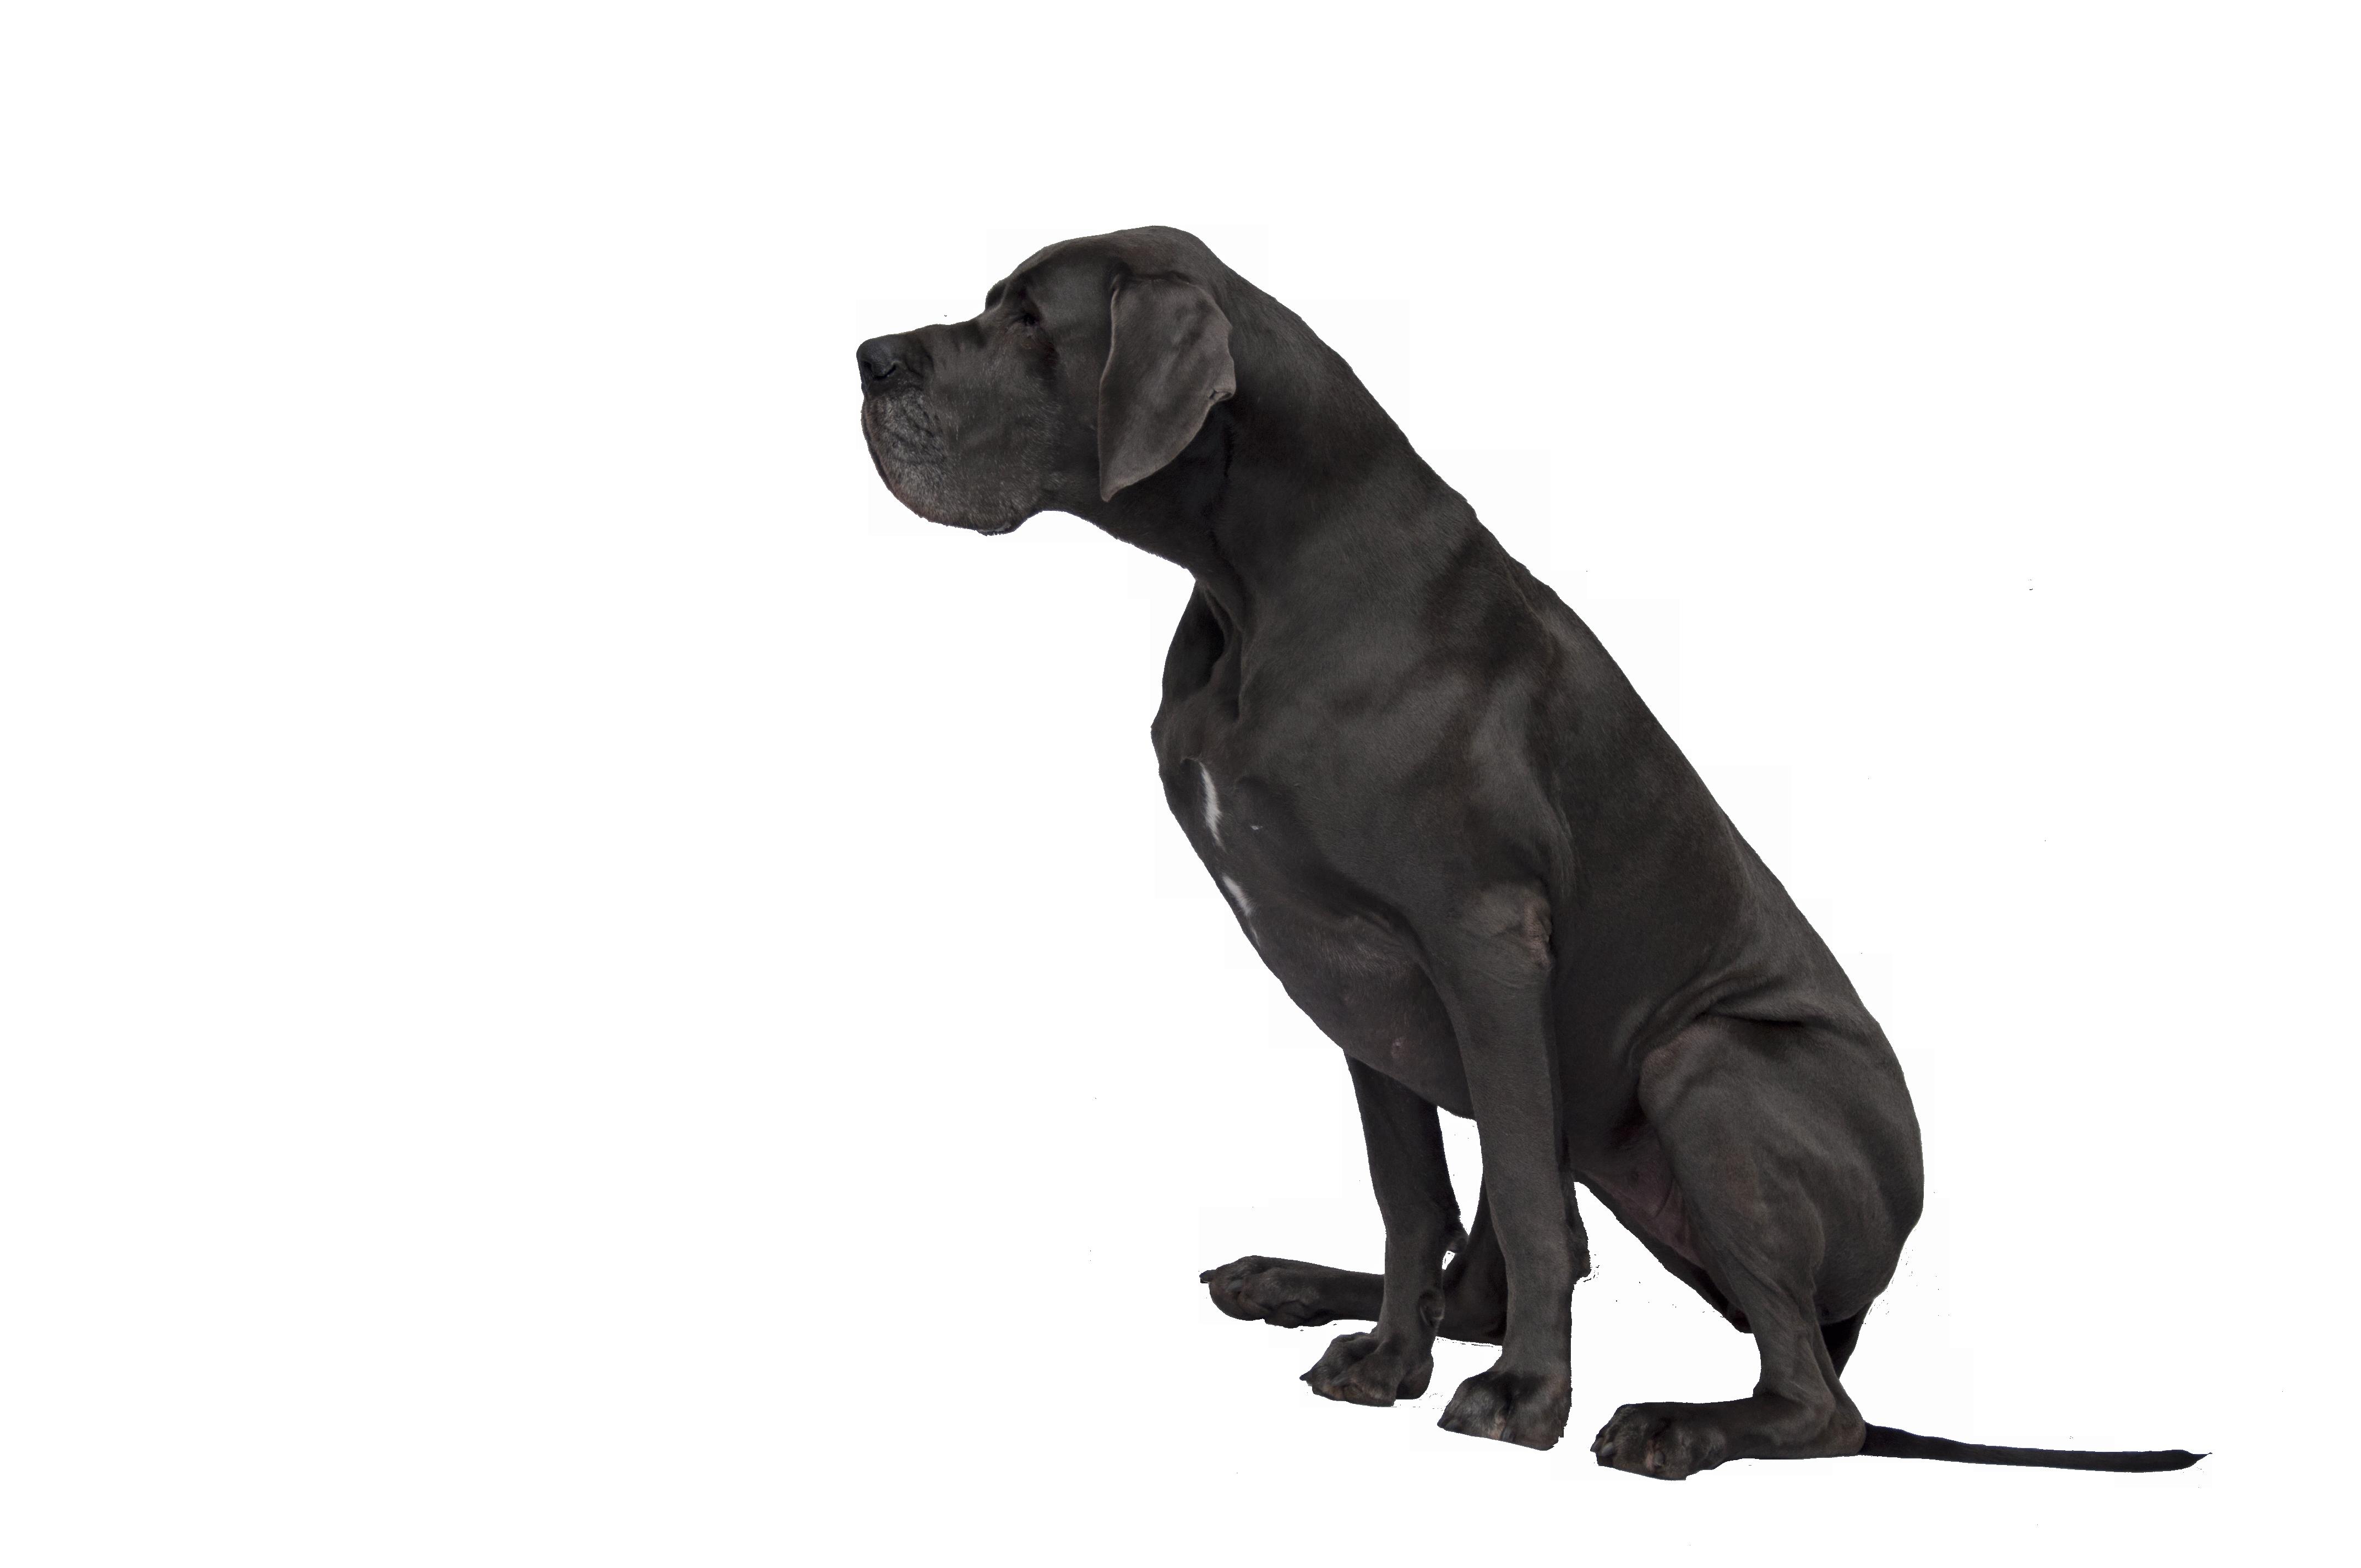 Black Great Dane Png Image Great Dane Puppy Black Great Danes Great Dane